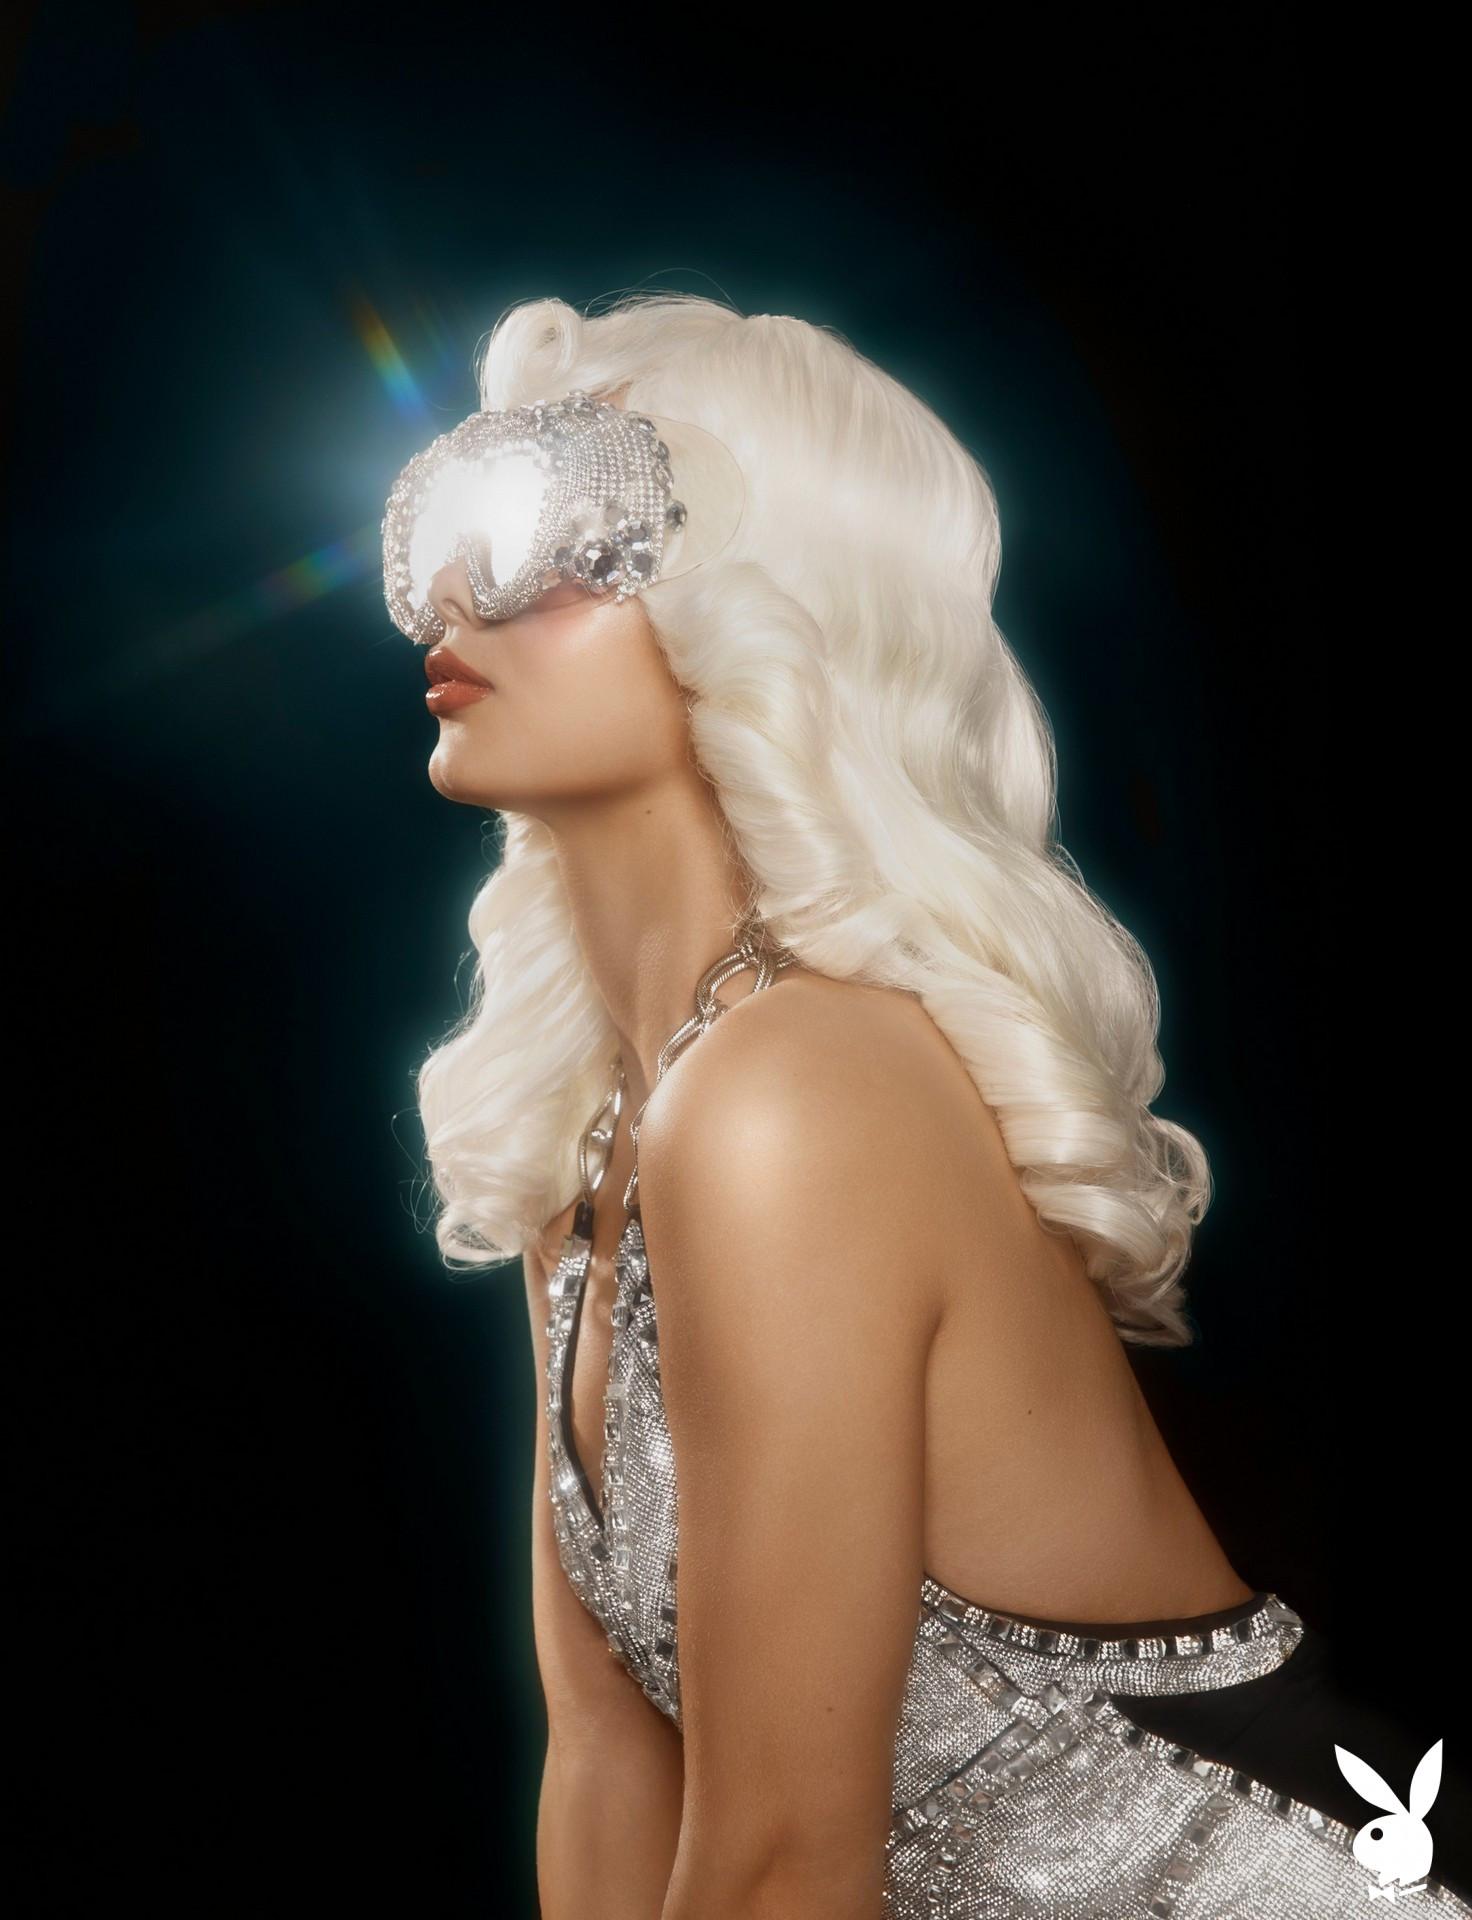 Elsa Jean Playboy Outtakes Playboy Plus (11)